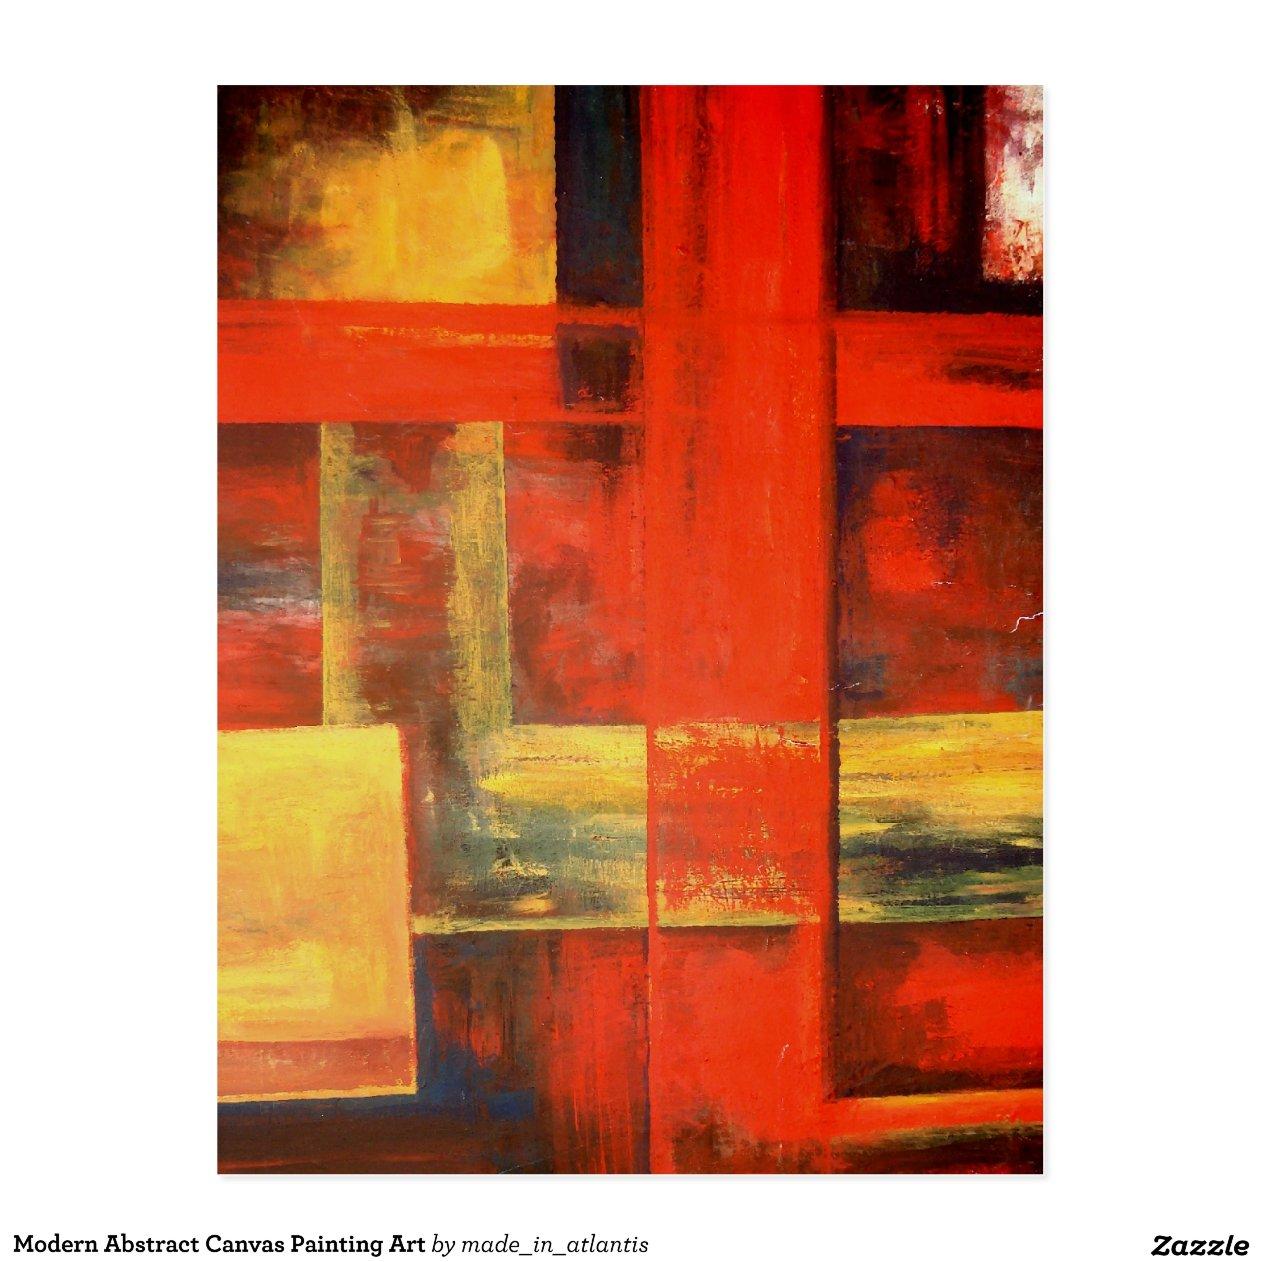 moderne abstrakte leinwand malerei kunst postkarten zazzle. Black Bedroom Furniture Sets. Home Design Ideas